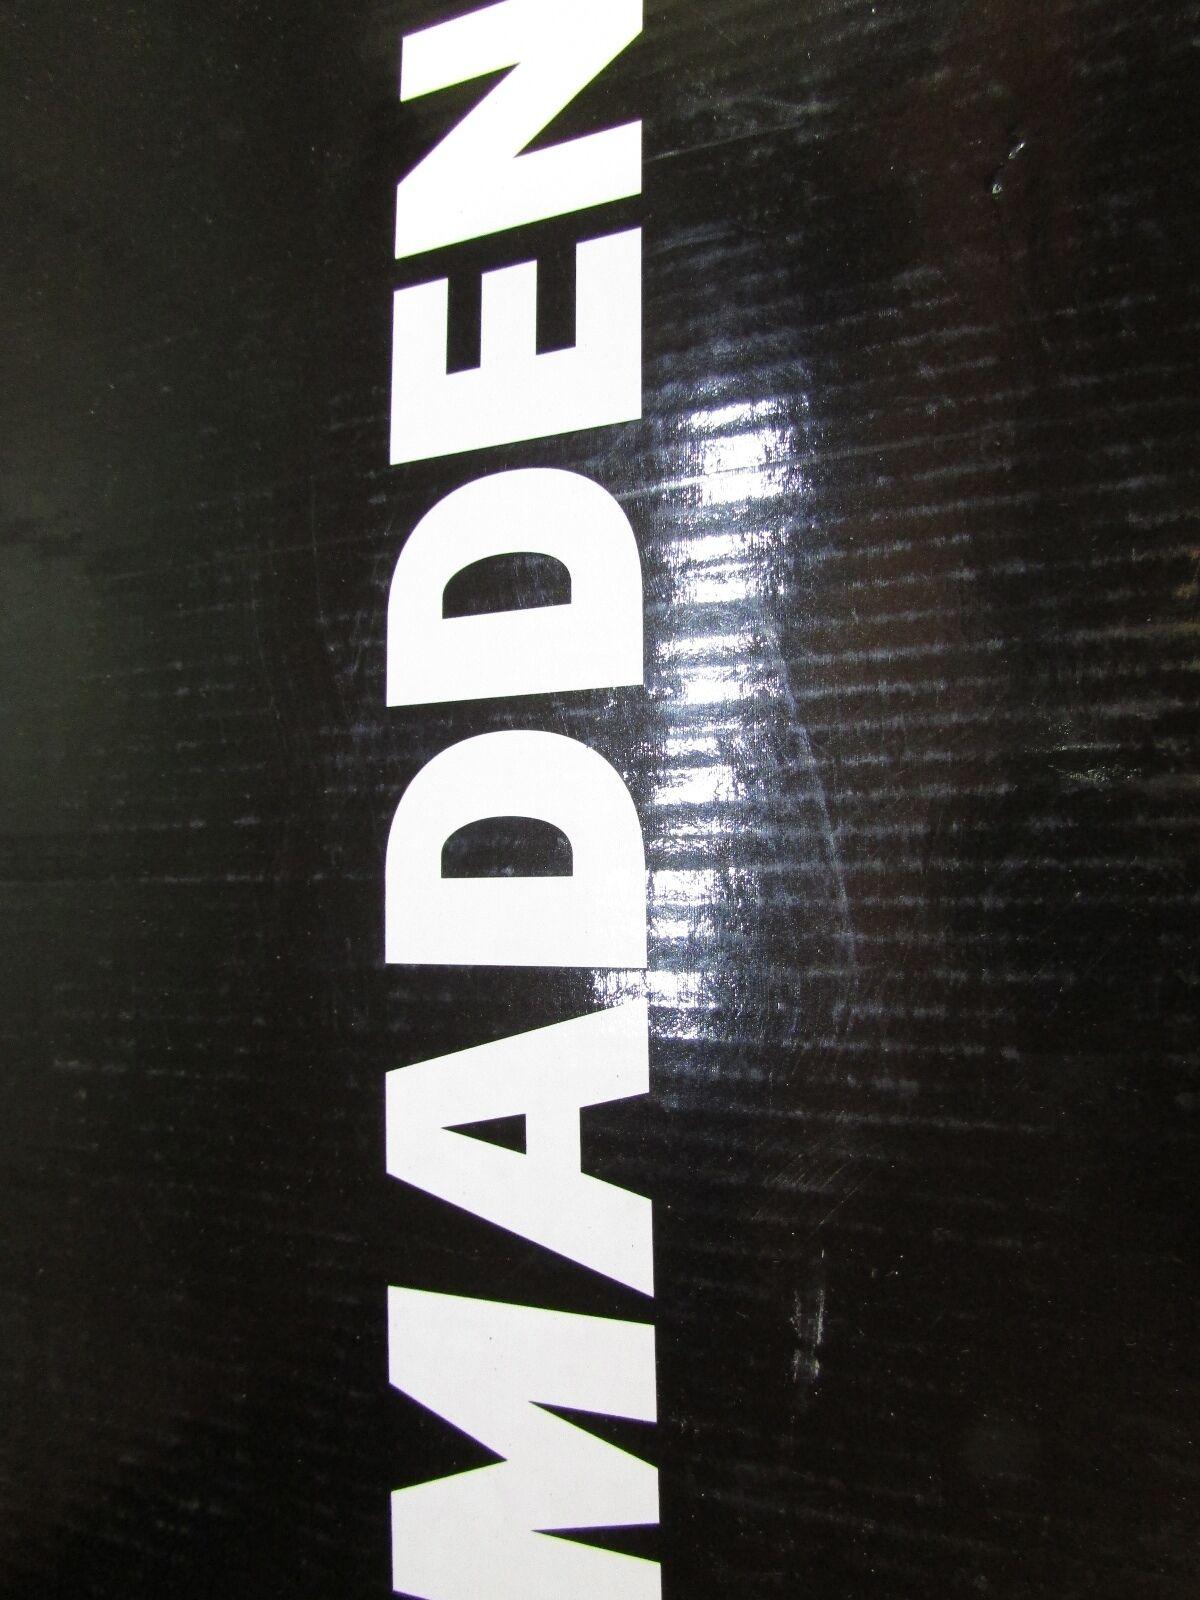 NEW STEVE MADDEN DIFFER BROWN ANKLE Stiefel  Herren SHIP 9.5 MADDEN M-DIFFER FREE SHIP Herren 6527b7